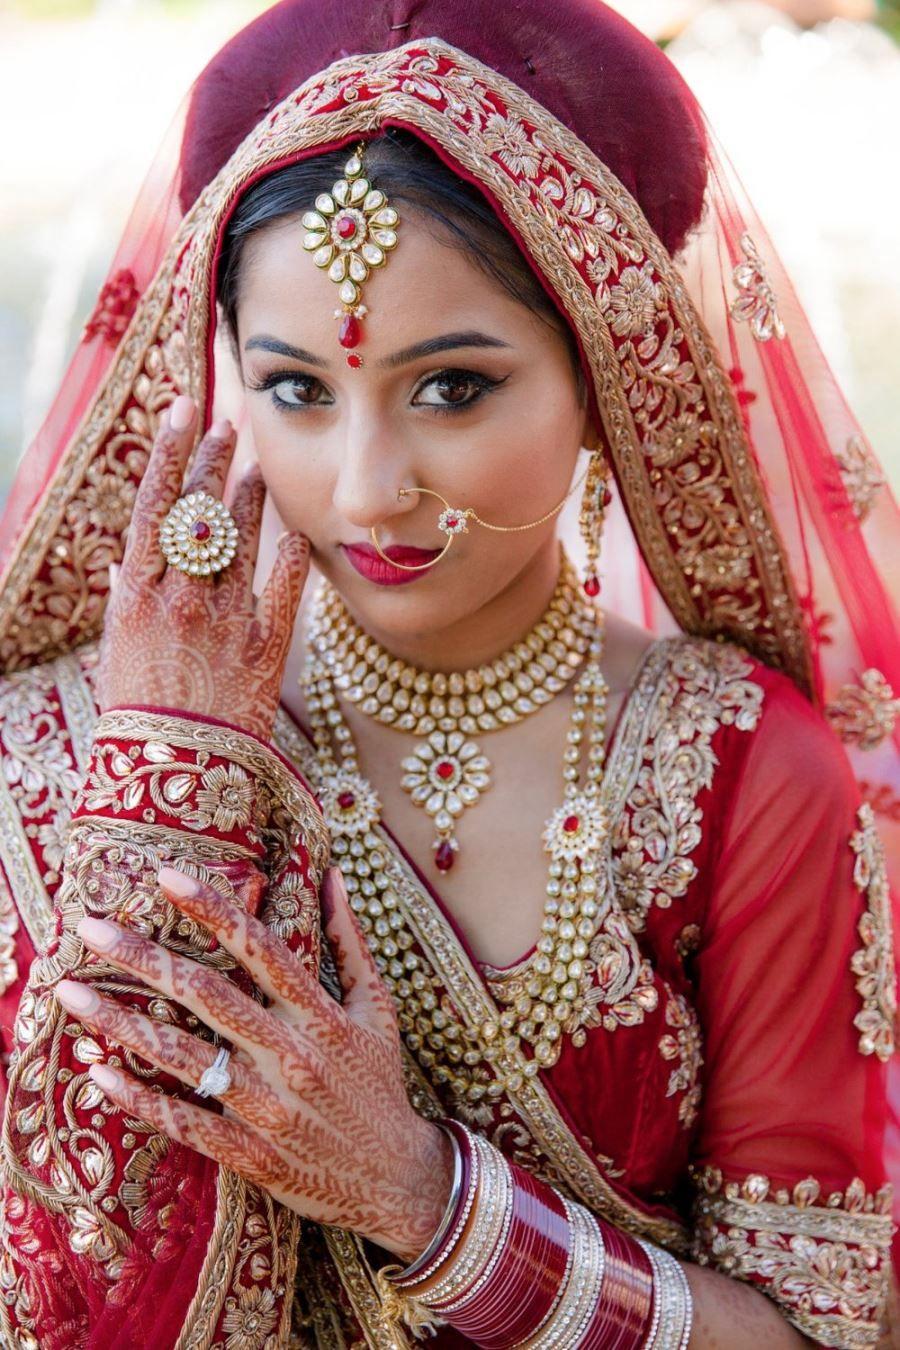 28+ Delicate Indian Wedding Ideas Indian wedding